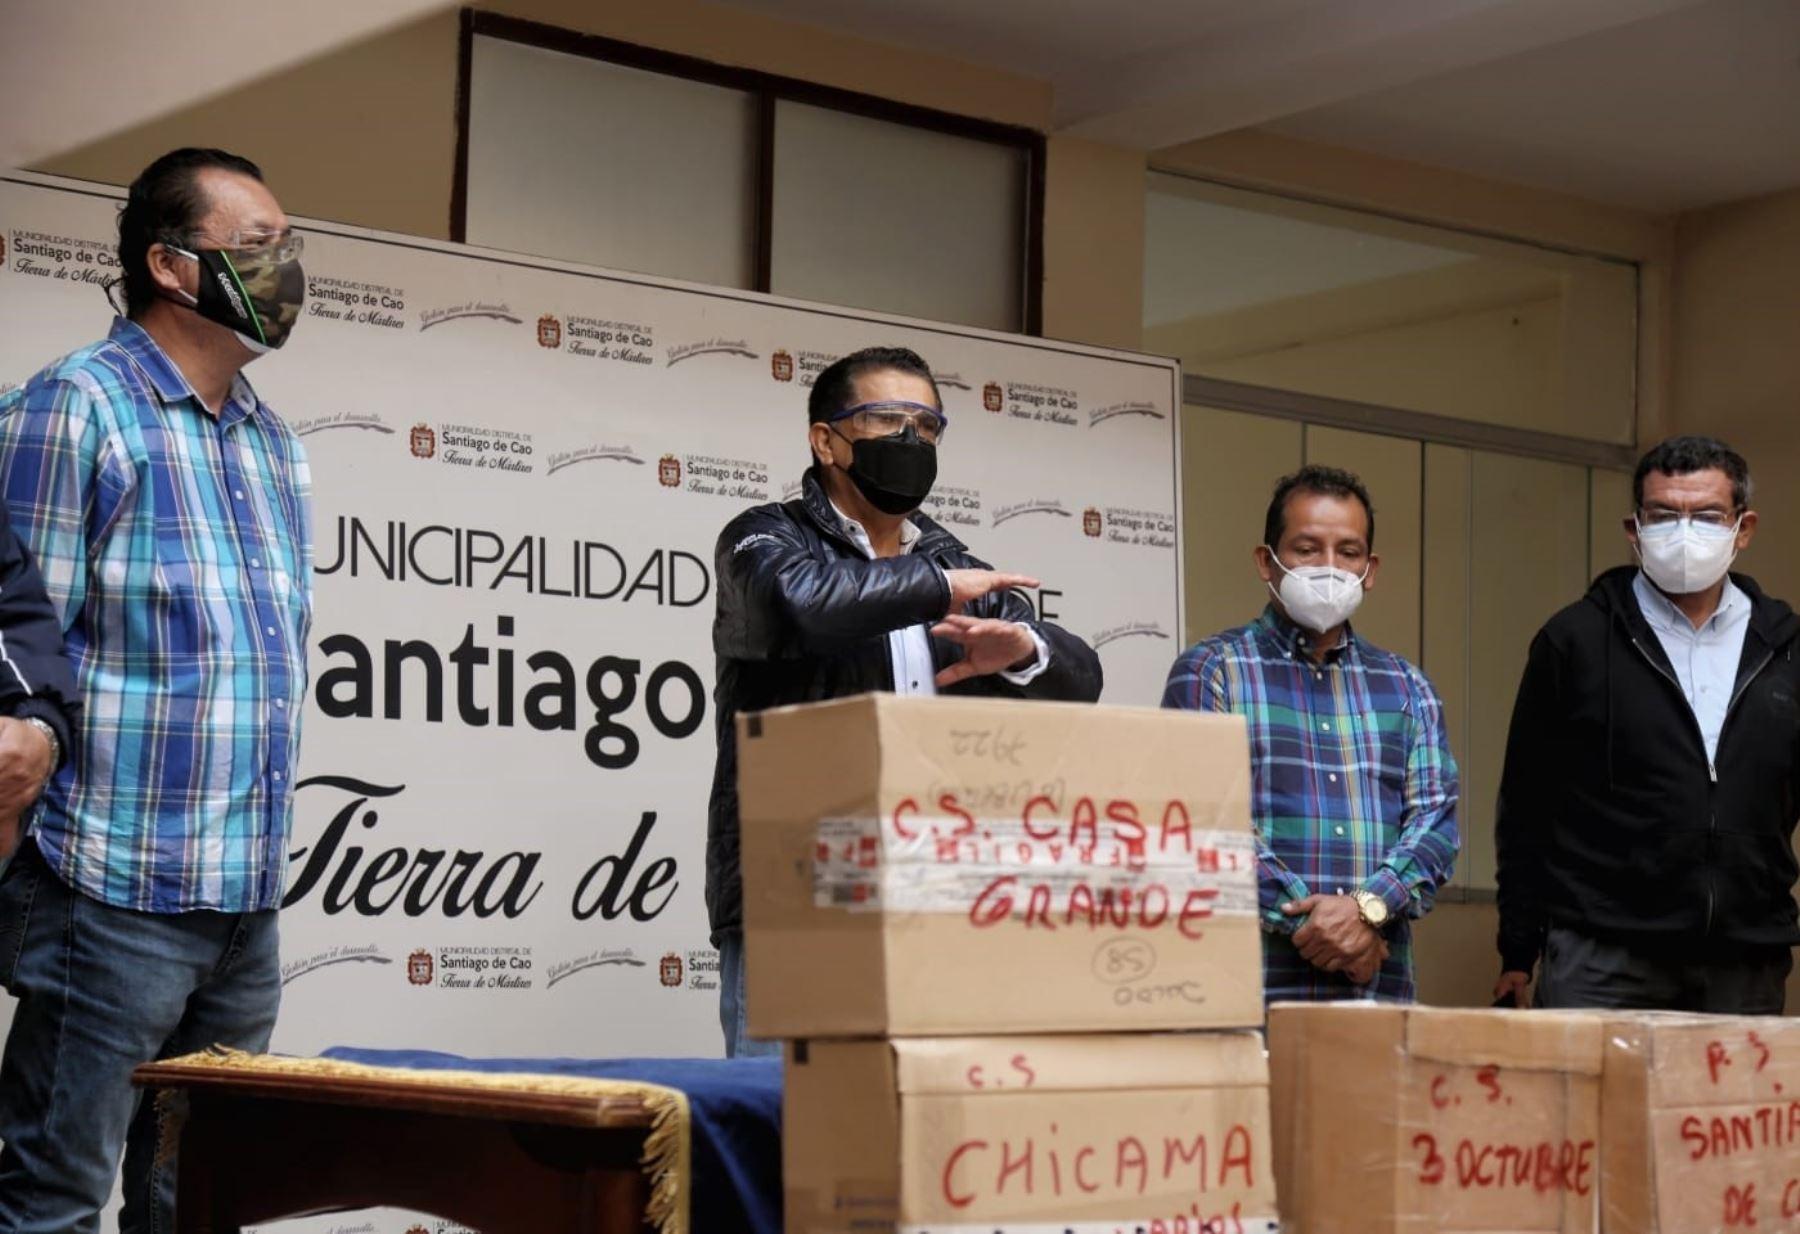 La Libertad habilitará centro temporal de hospitalización covid-19 en Ascope para atender a afectados por esa enfermedad. ANDINA/Difusión